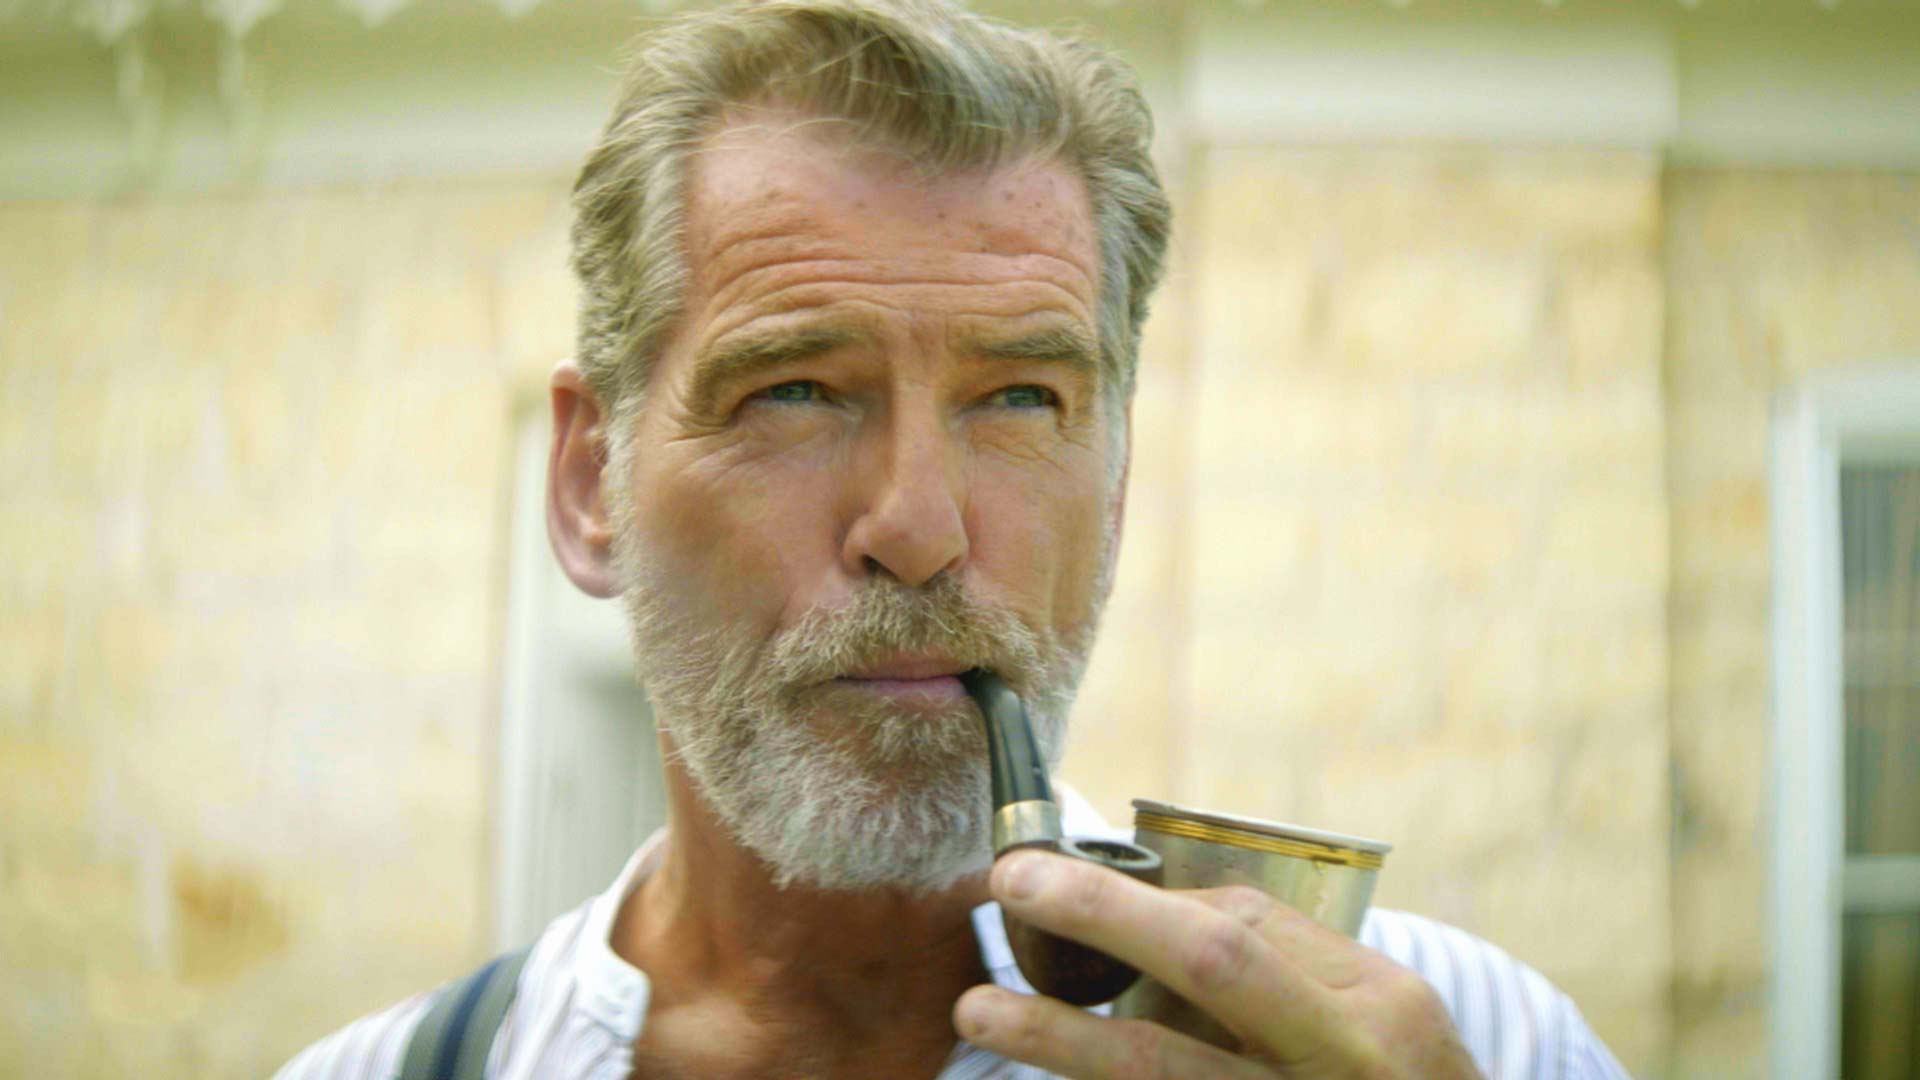 Pierce Brosnan smokes a pipe in The Son